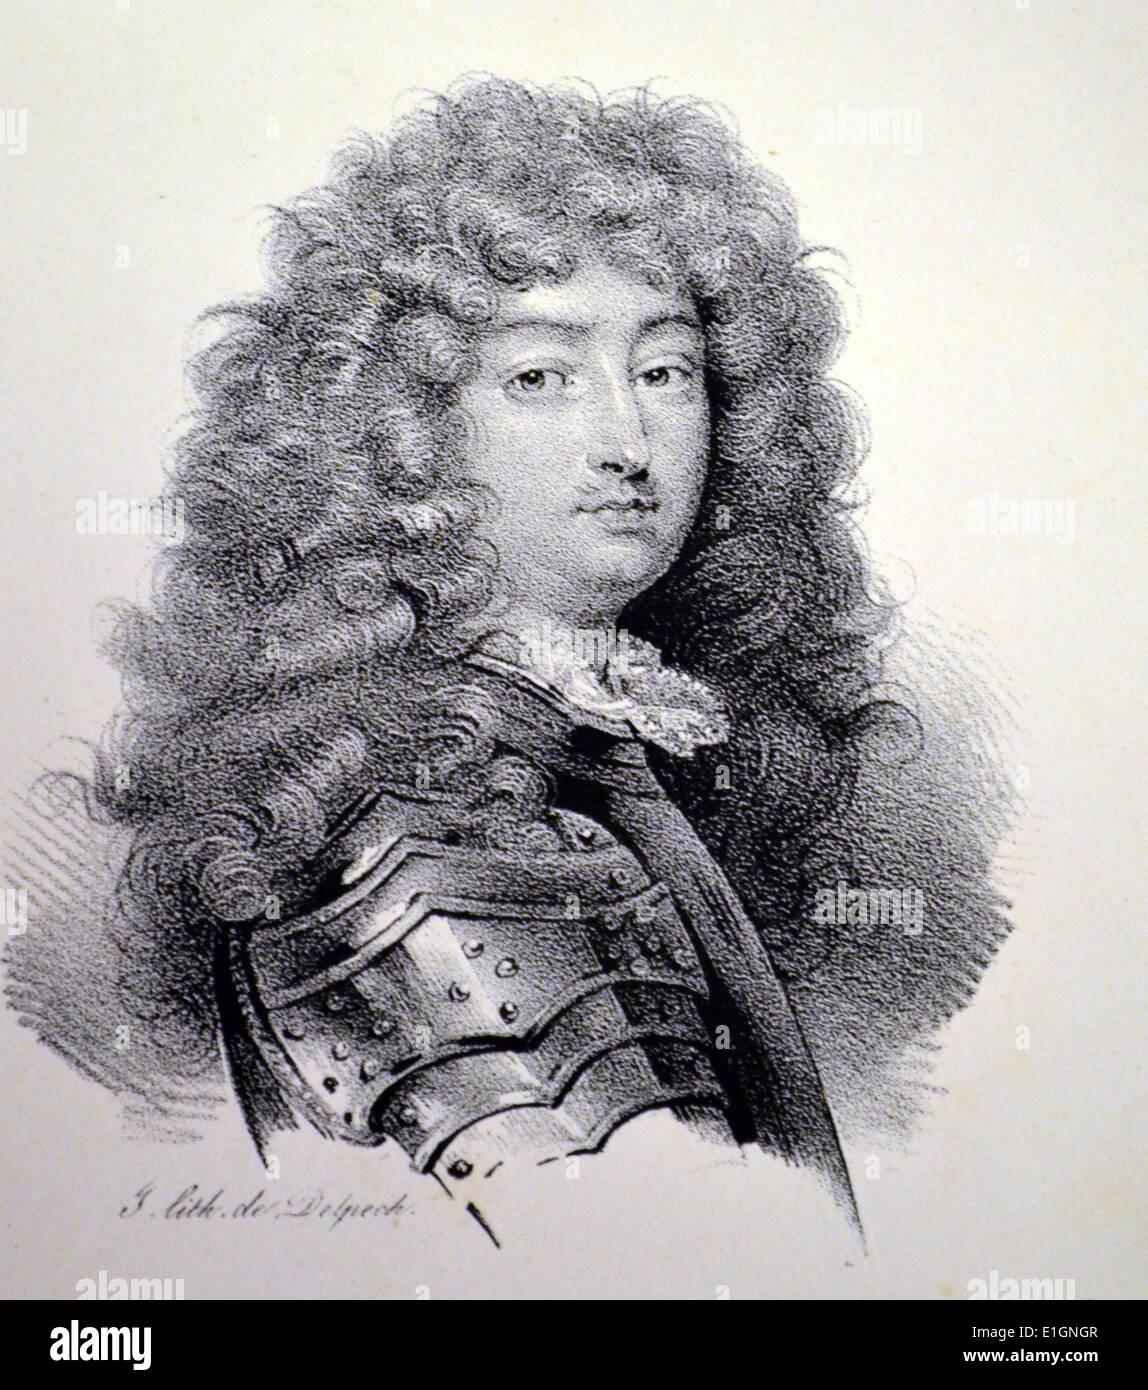 Louis XIV (1638-1715) the Sun King. King of France 1613-1715. Lithograph, Paris, c1840. Stock Photo